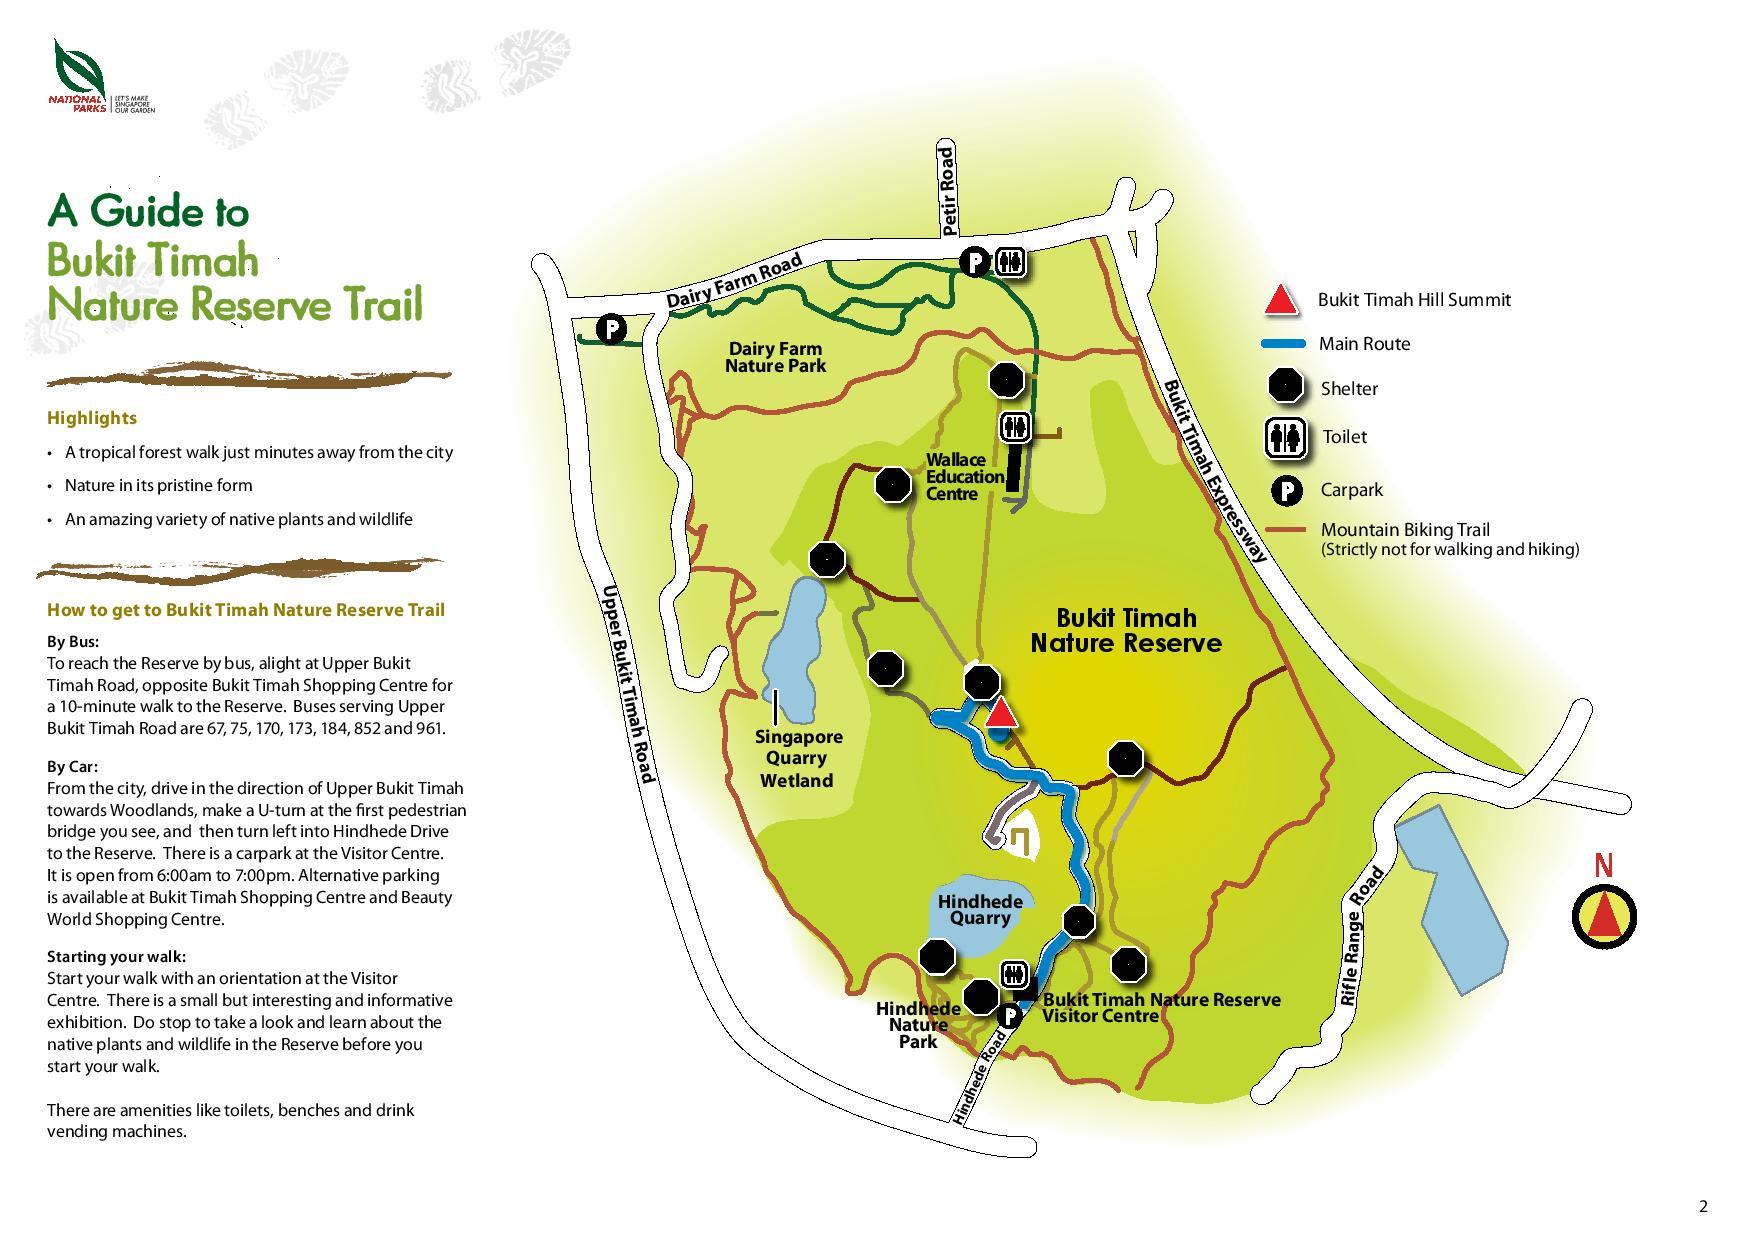 Bukit Timah Nature Reserve 10